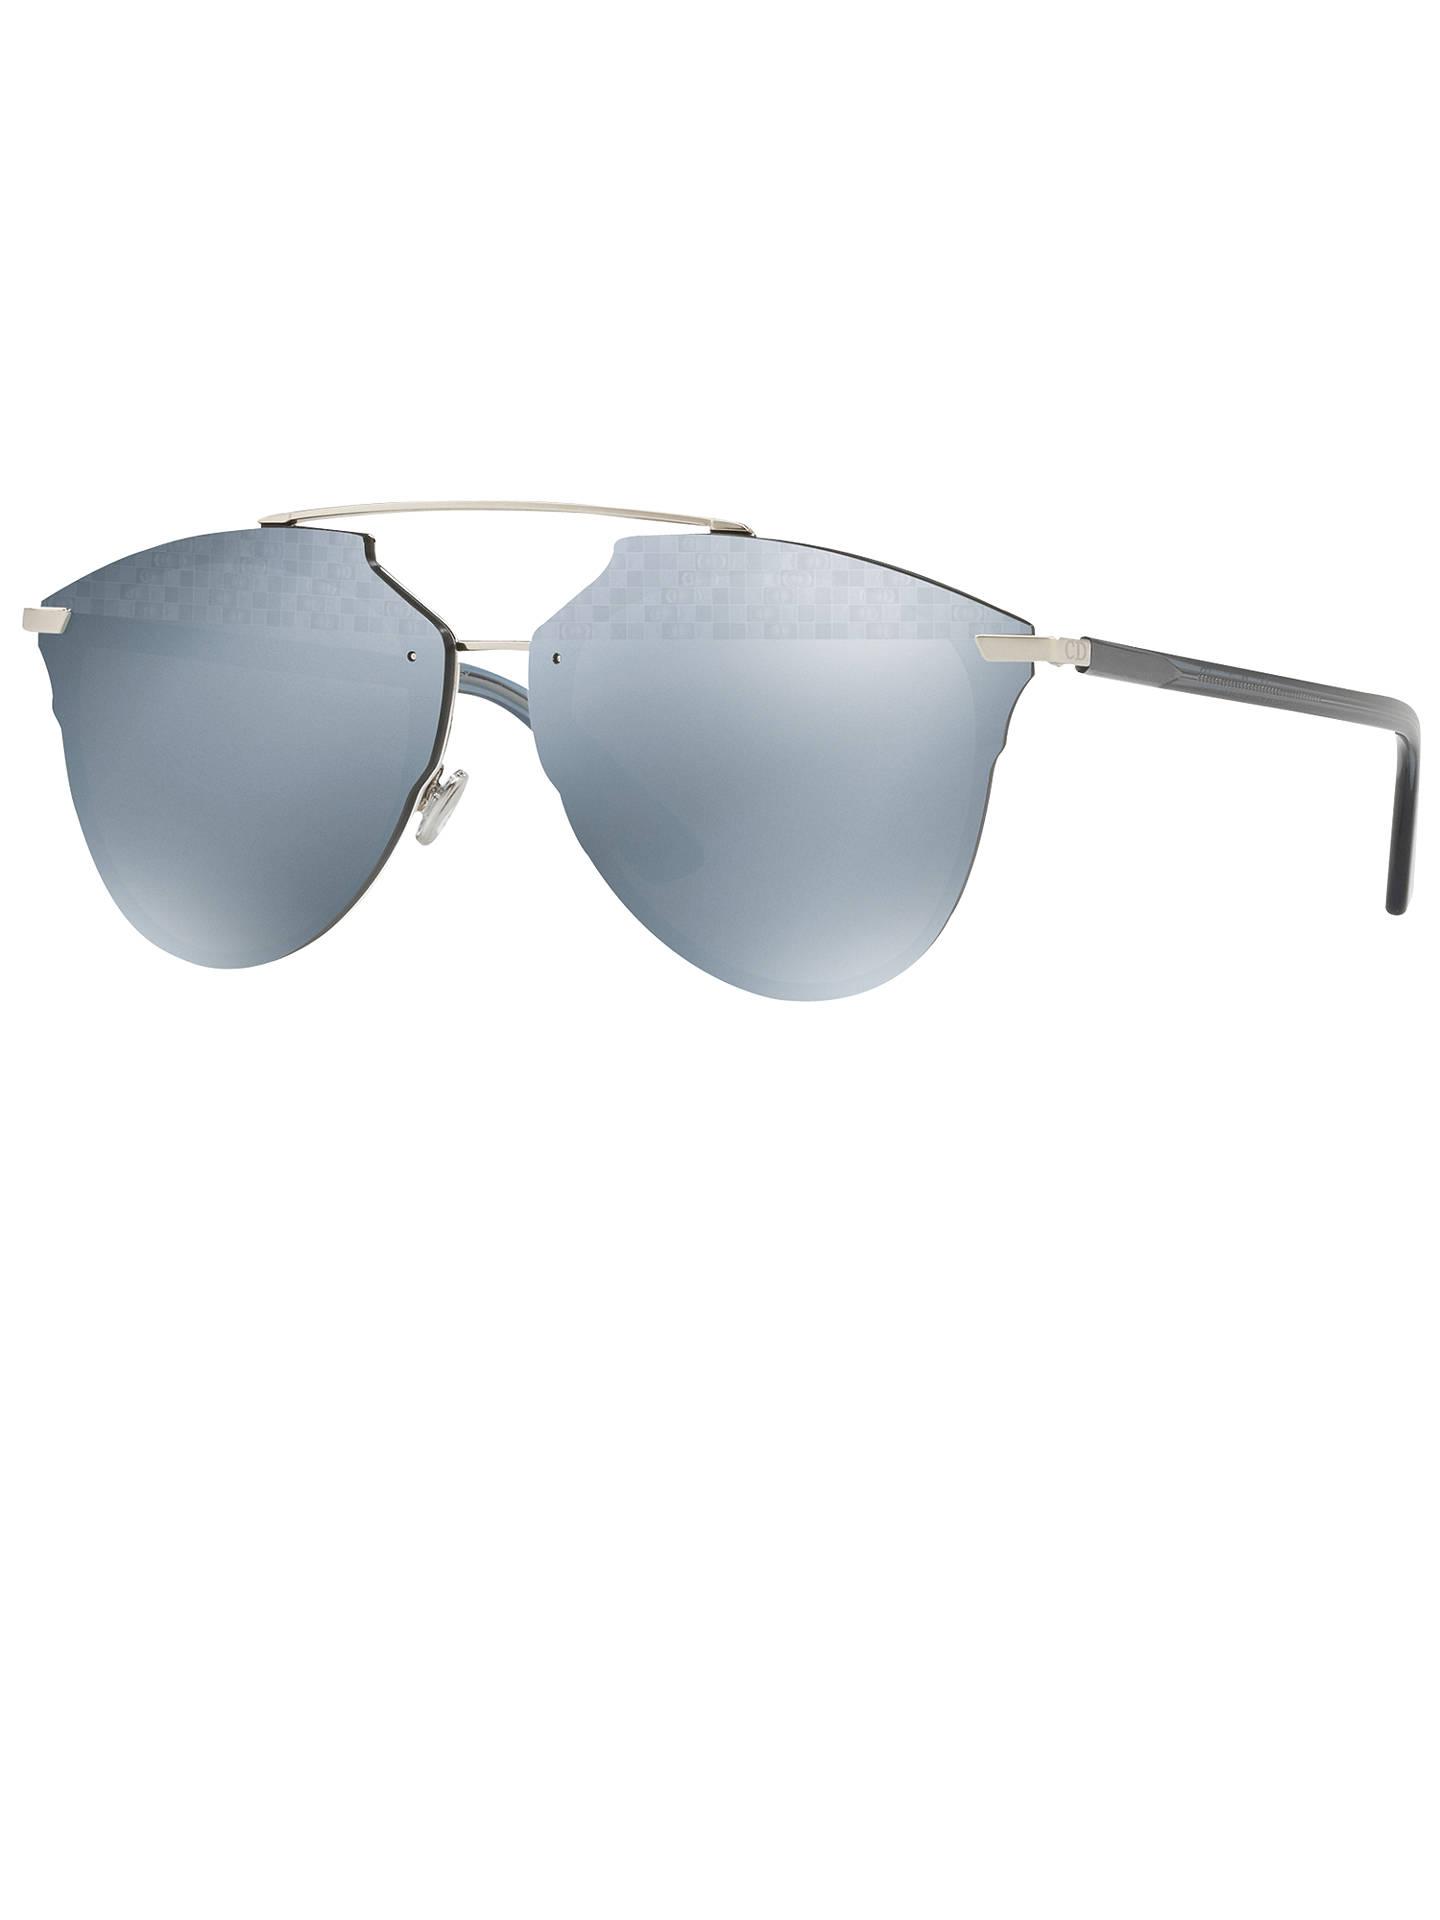 37ab9839ac4f Dior DiorReflectedP Geometric Sunglasses at John Lewis   Partners